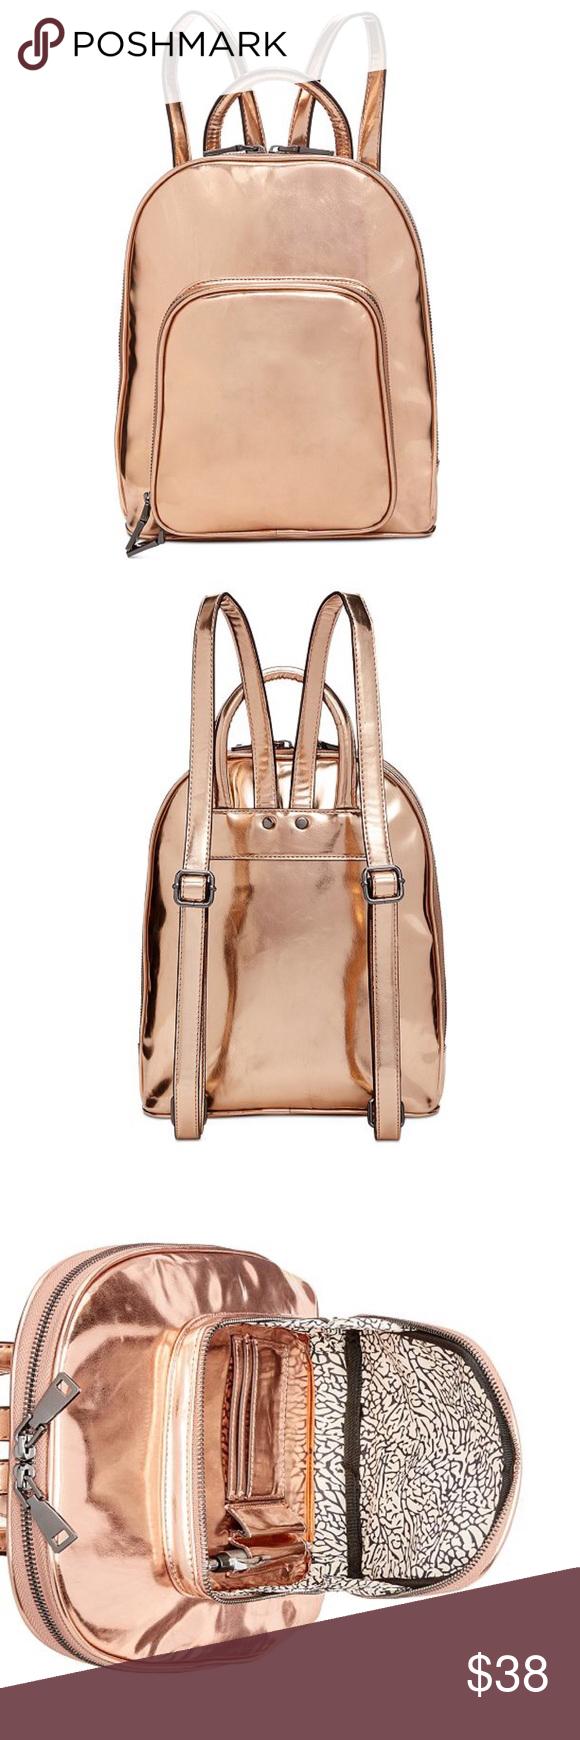 082a0b0af462 Inc International Concepts Farahh Backpack Bag NWT Inc International  Concepts Women s Farahh Backpack Shoulder Bag Inc International Concepts  100% authentic ...